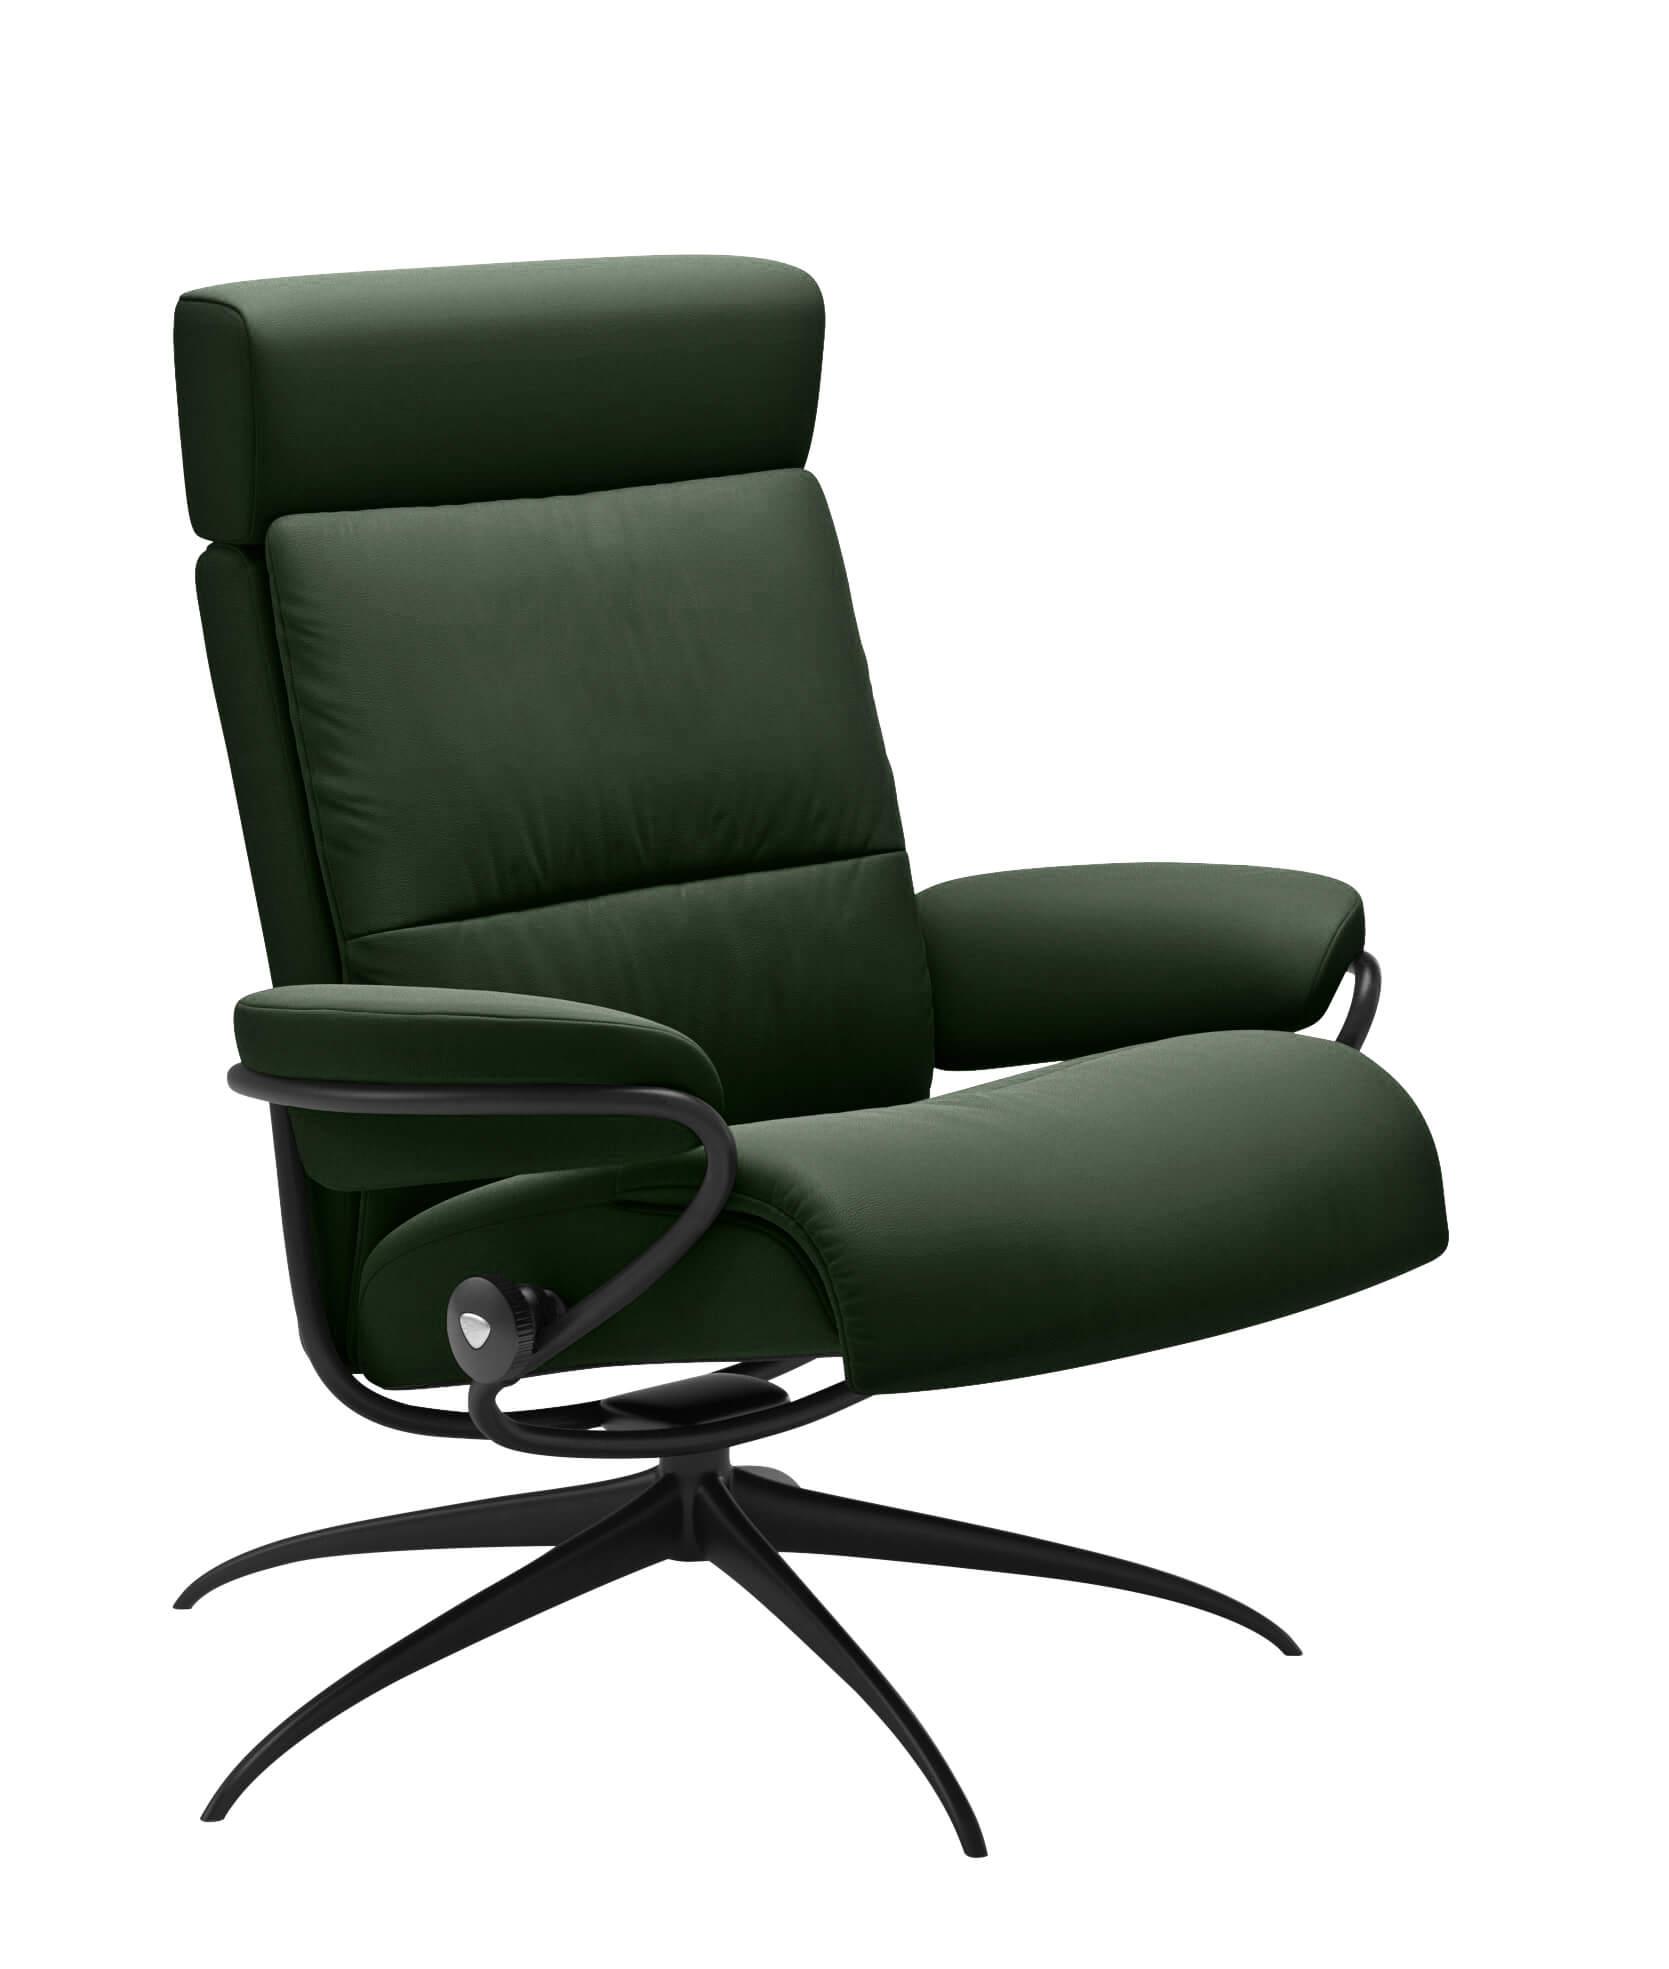 Phenomenal Stressless Tokyo Incl Headrest Easysit Nl Bralicious Painted Fabric Chair Ideas Braliciousco